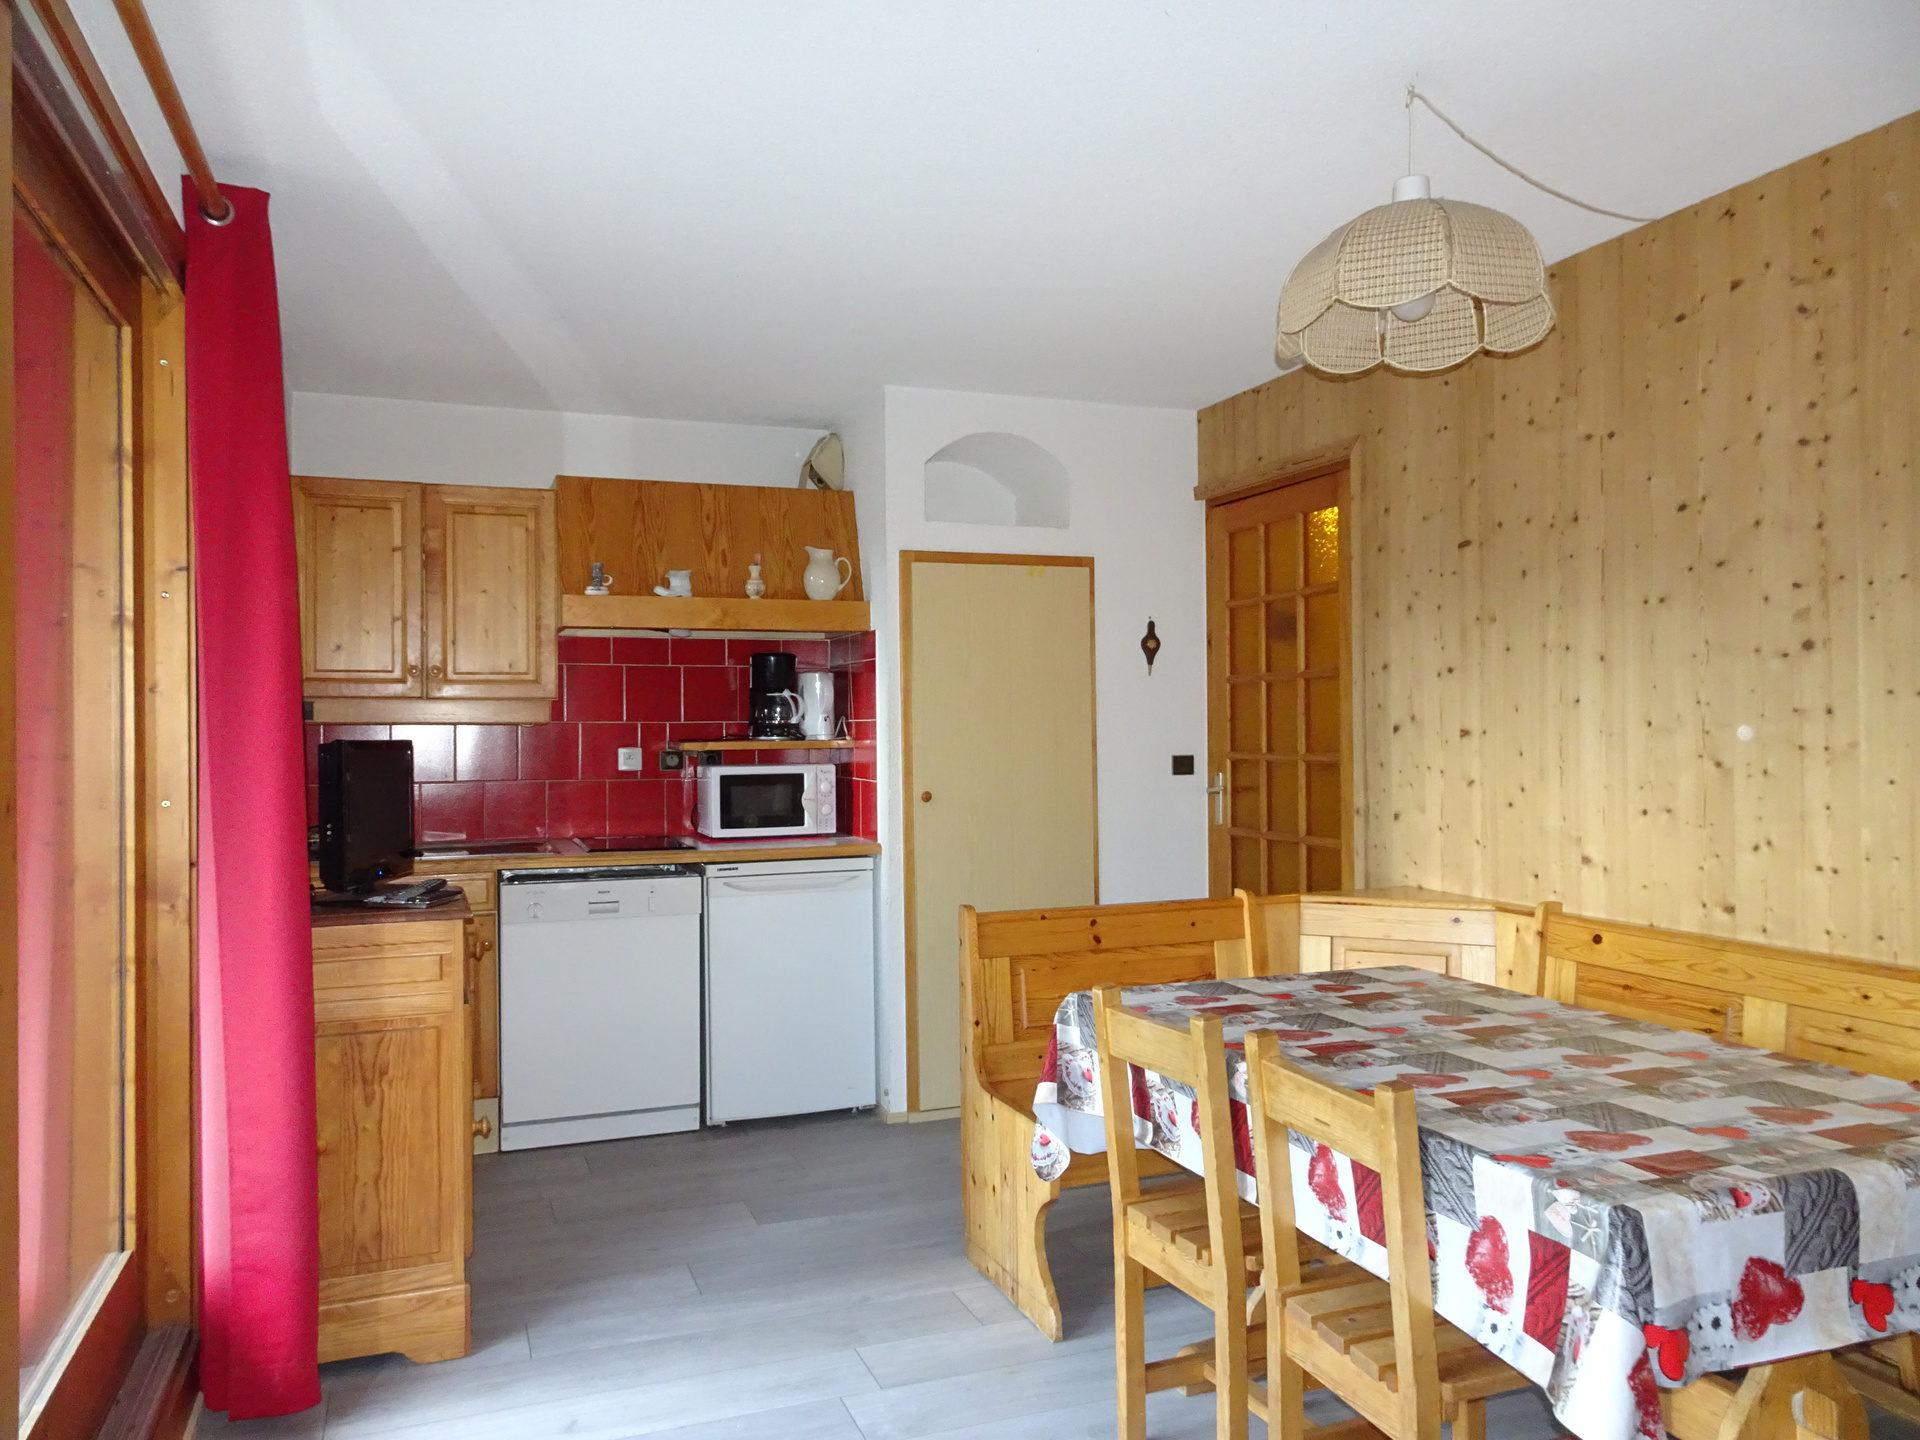 Rental reference : GLACIEA3 to Pralognan la Vanoise